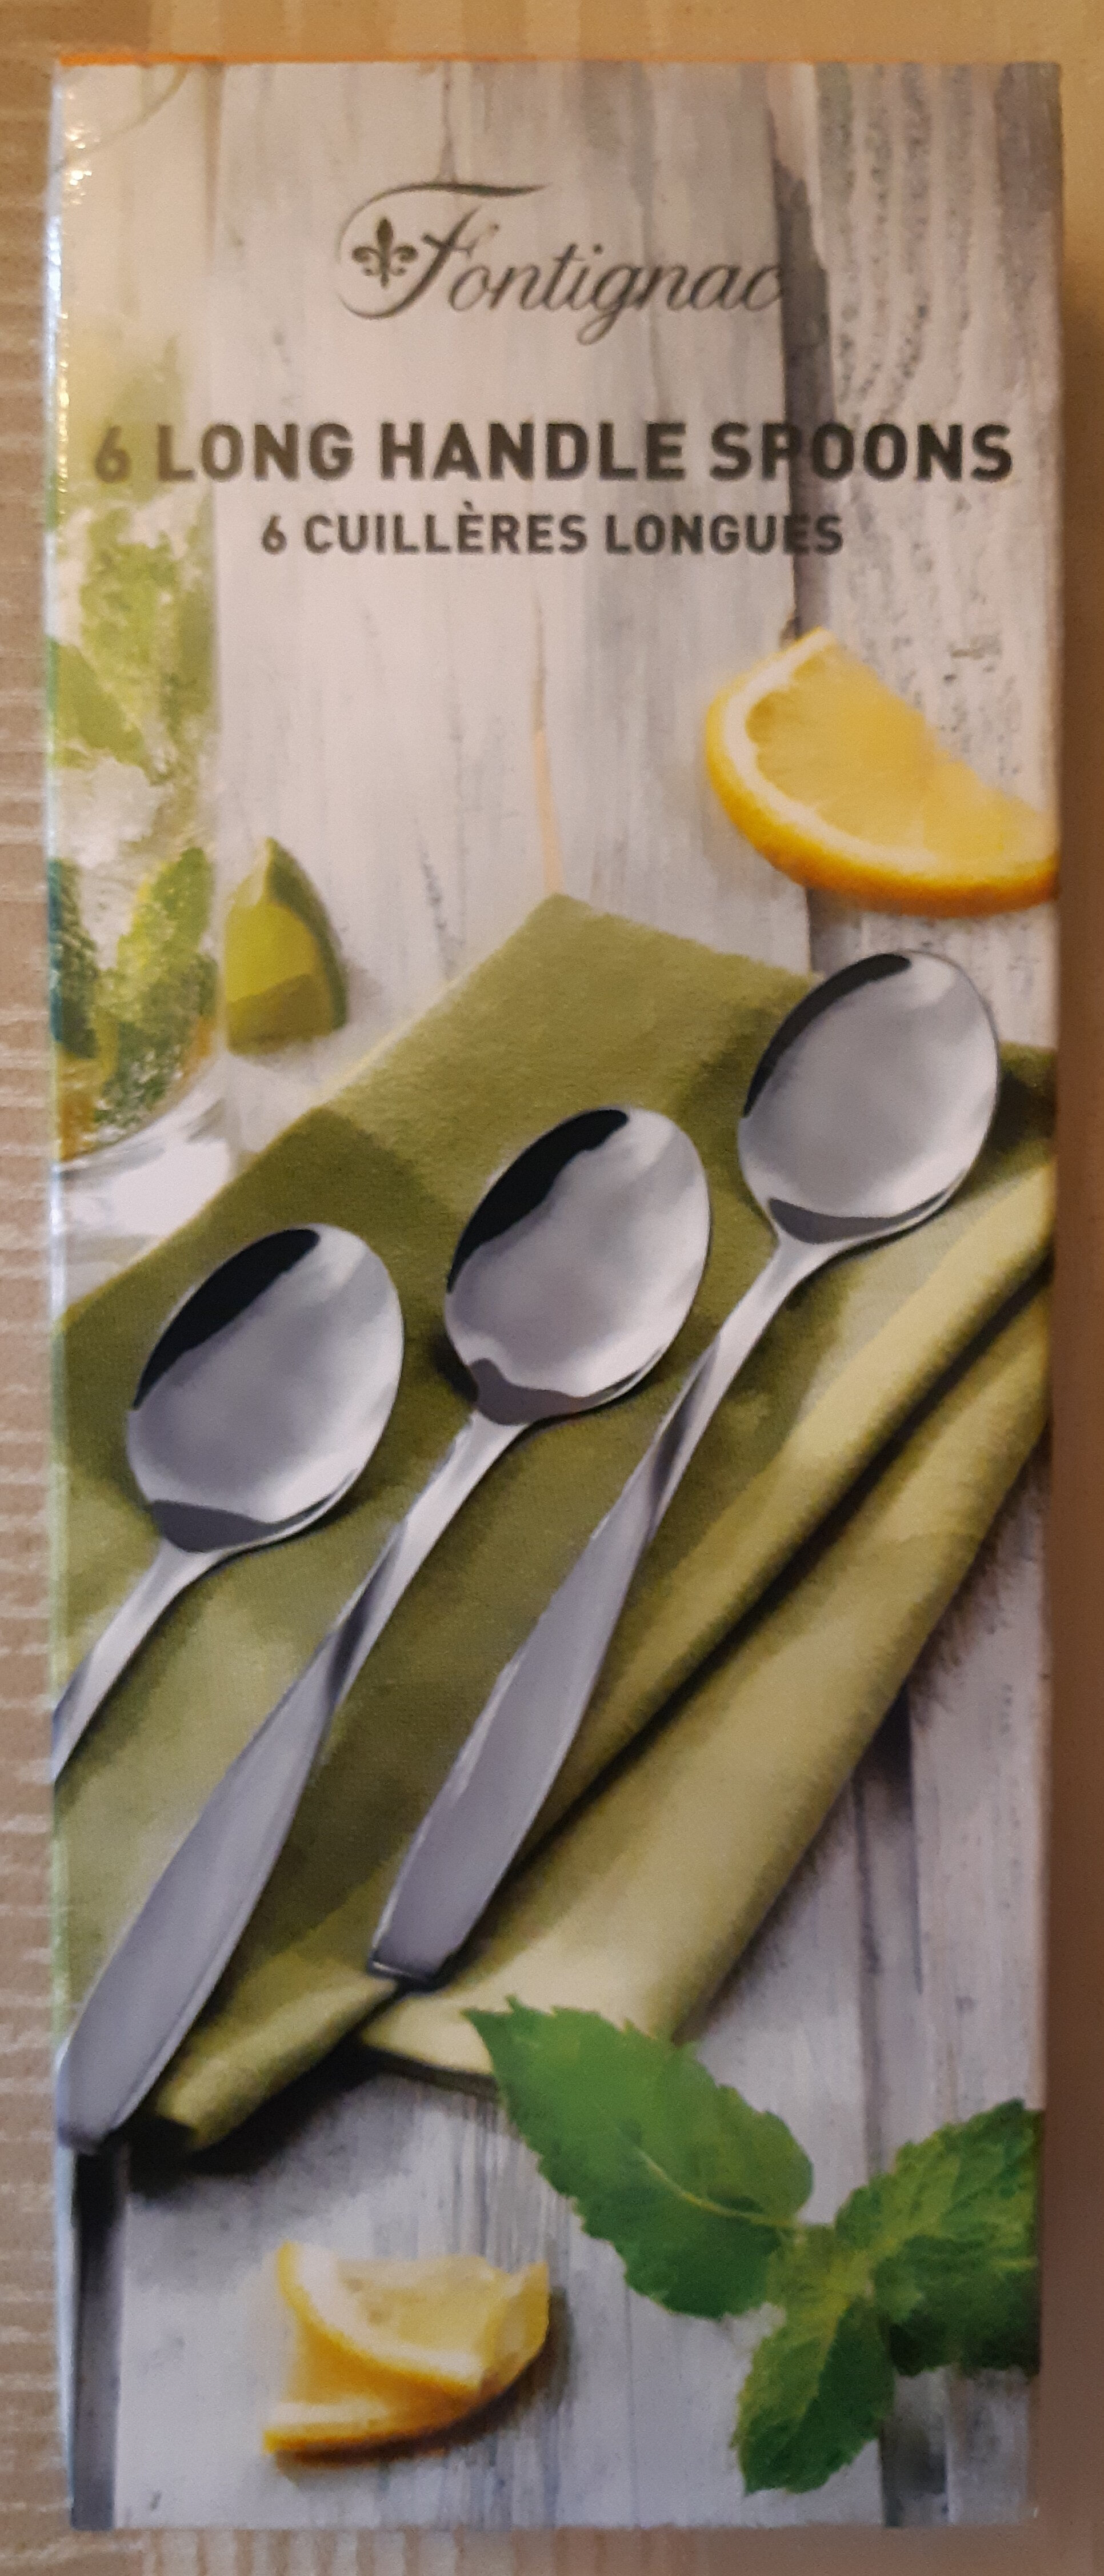 Petites cuillères longues - Product - fr